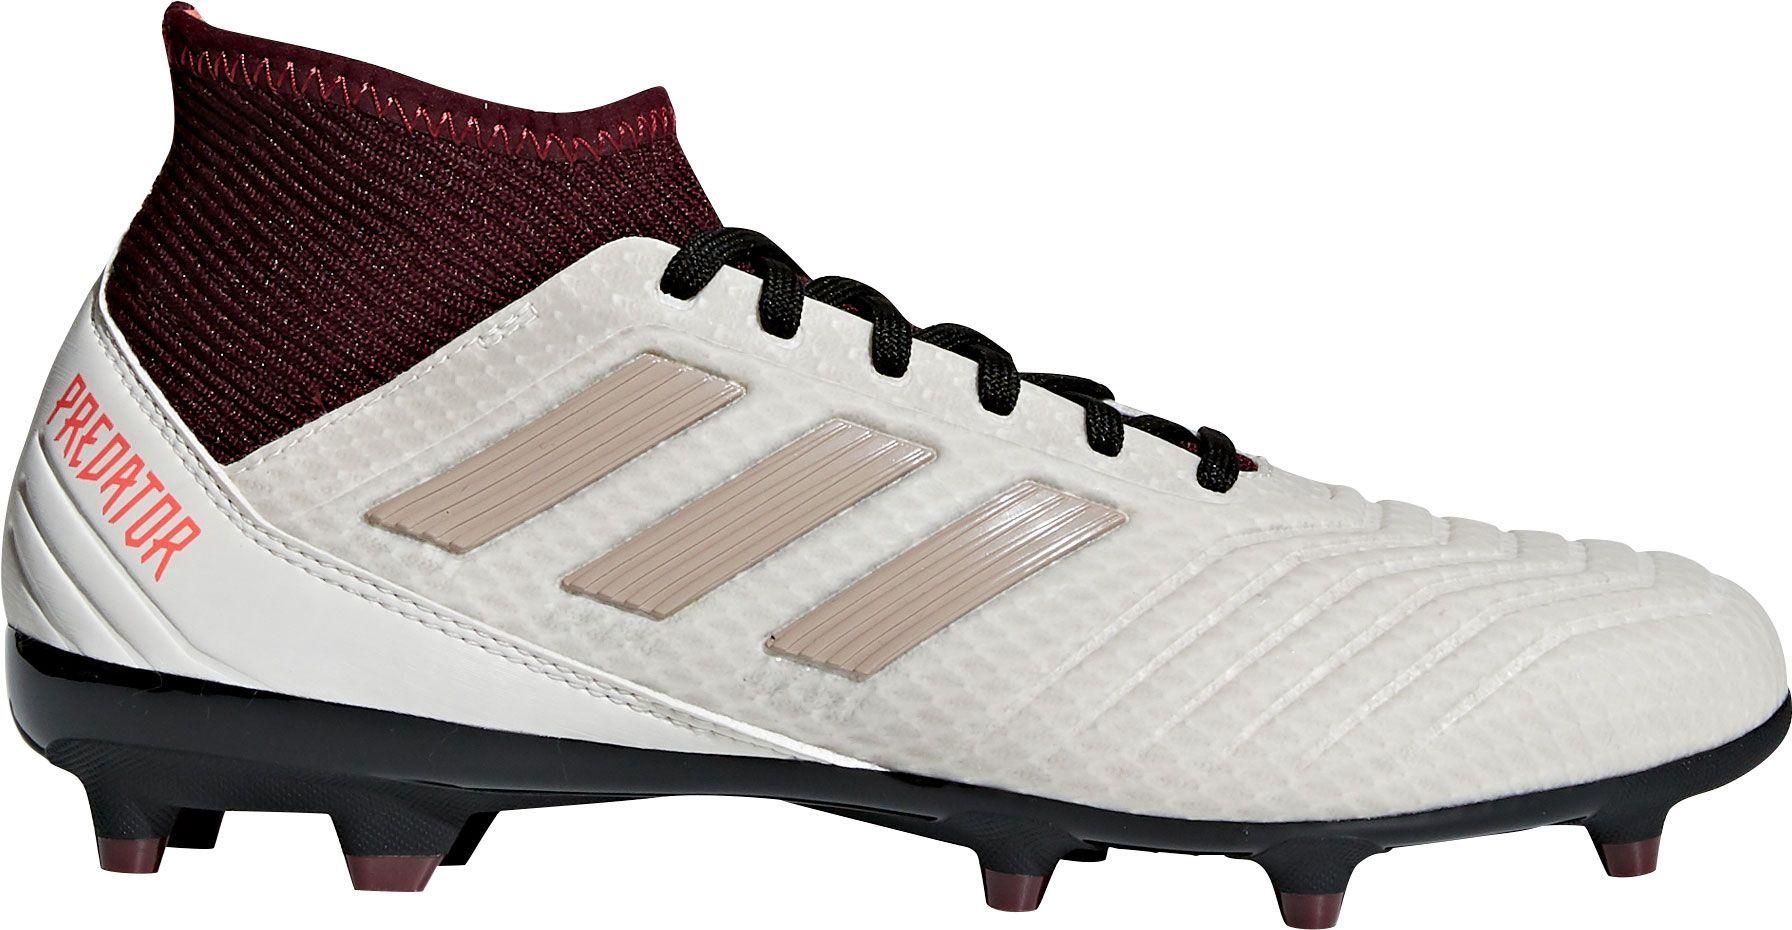 Adidas Women S Predator 18 3 Fg Soccer Cleats Cleats Soccer Cleats Adidas Women Adidas Predator